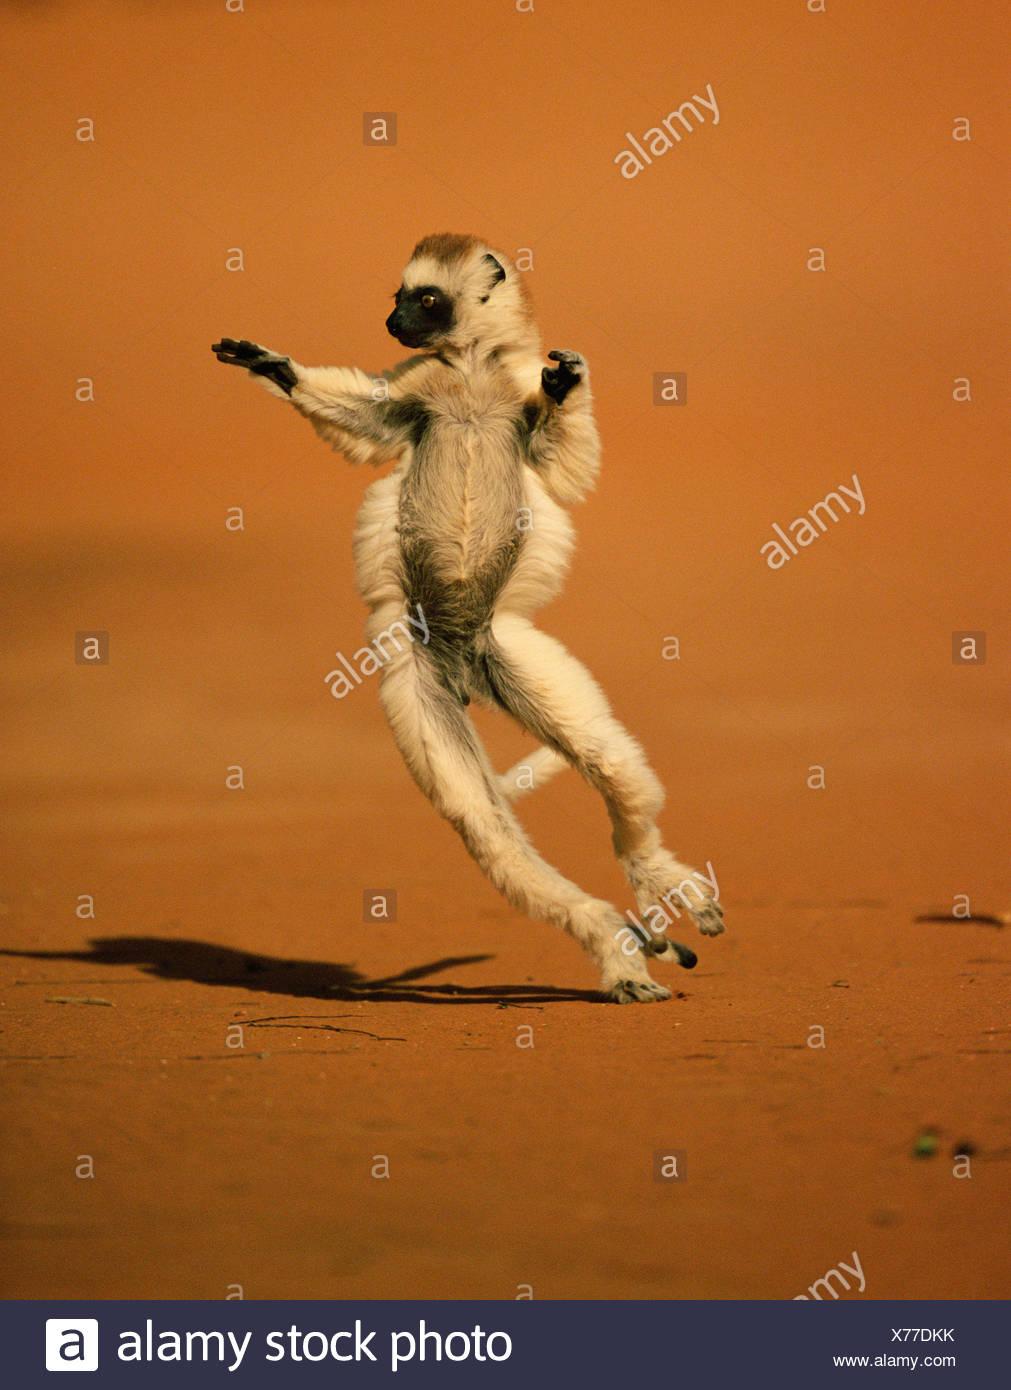 VERREAUX'S SIFAKA (Propithecus verreauxi) dancing. Madagascar - Stock Image